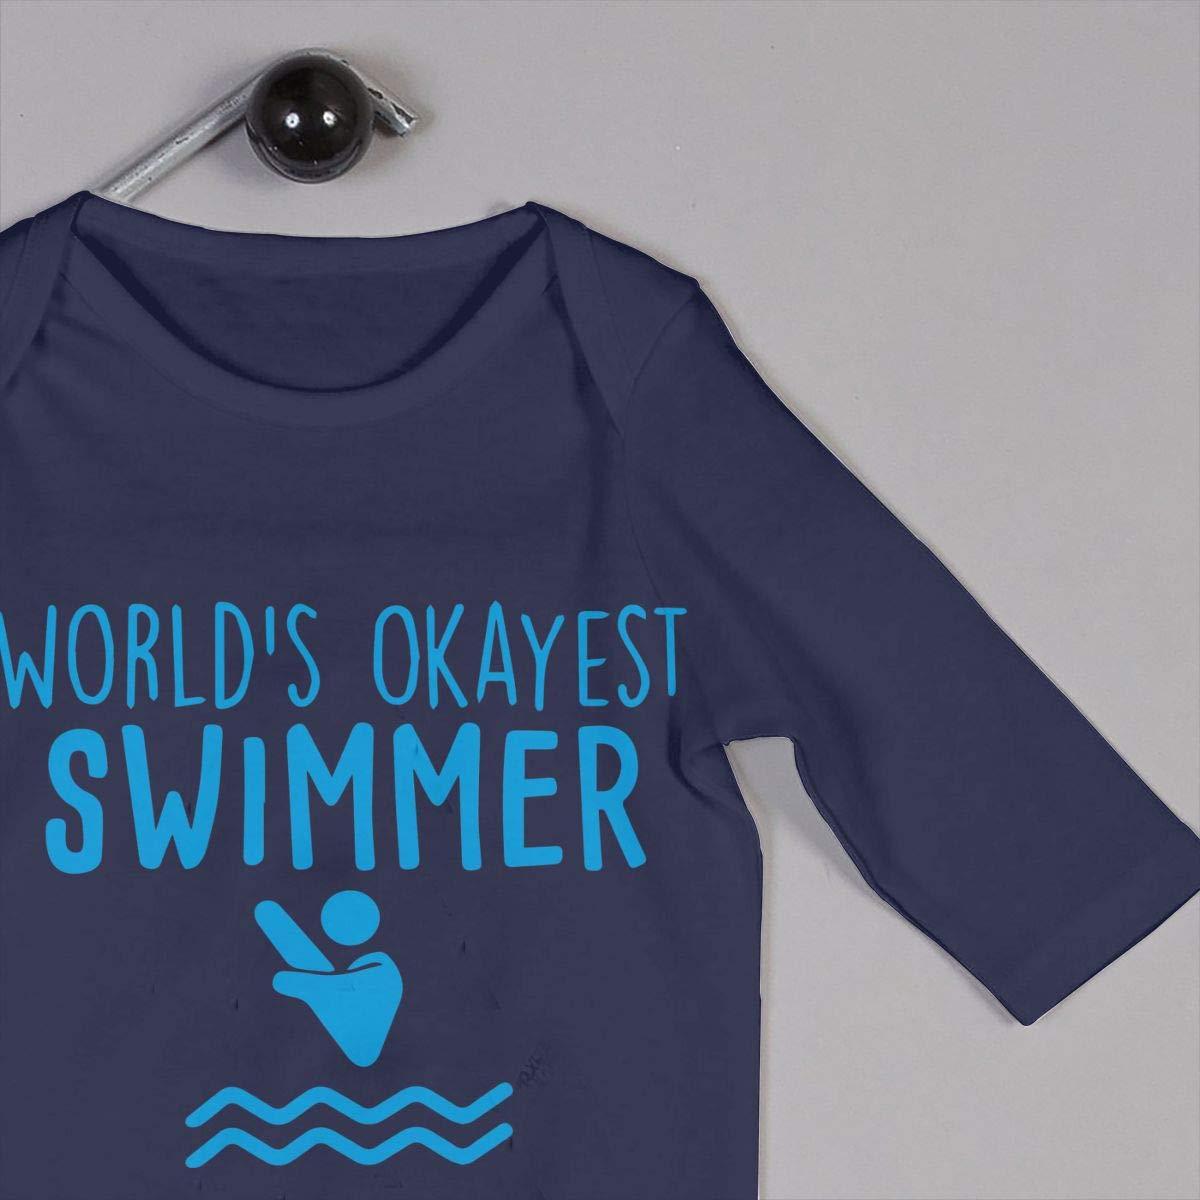 LBJQ8 Worlds Okayest Swimmer-1 Newborn Infant Baby Girls Long Sleeve Bodysuits Coverall Jumpsuit